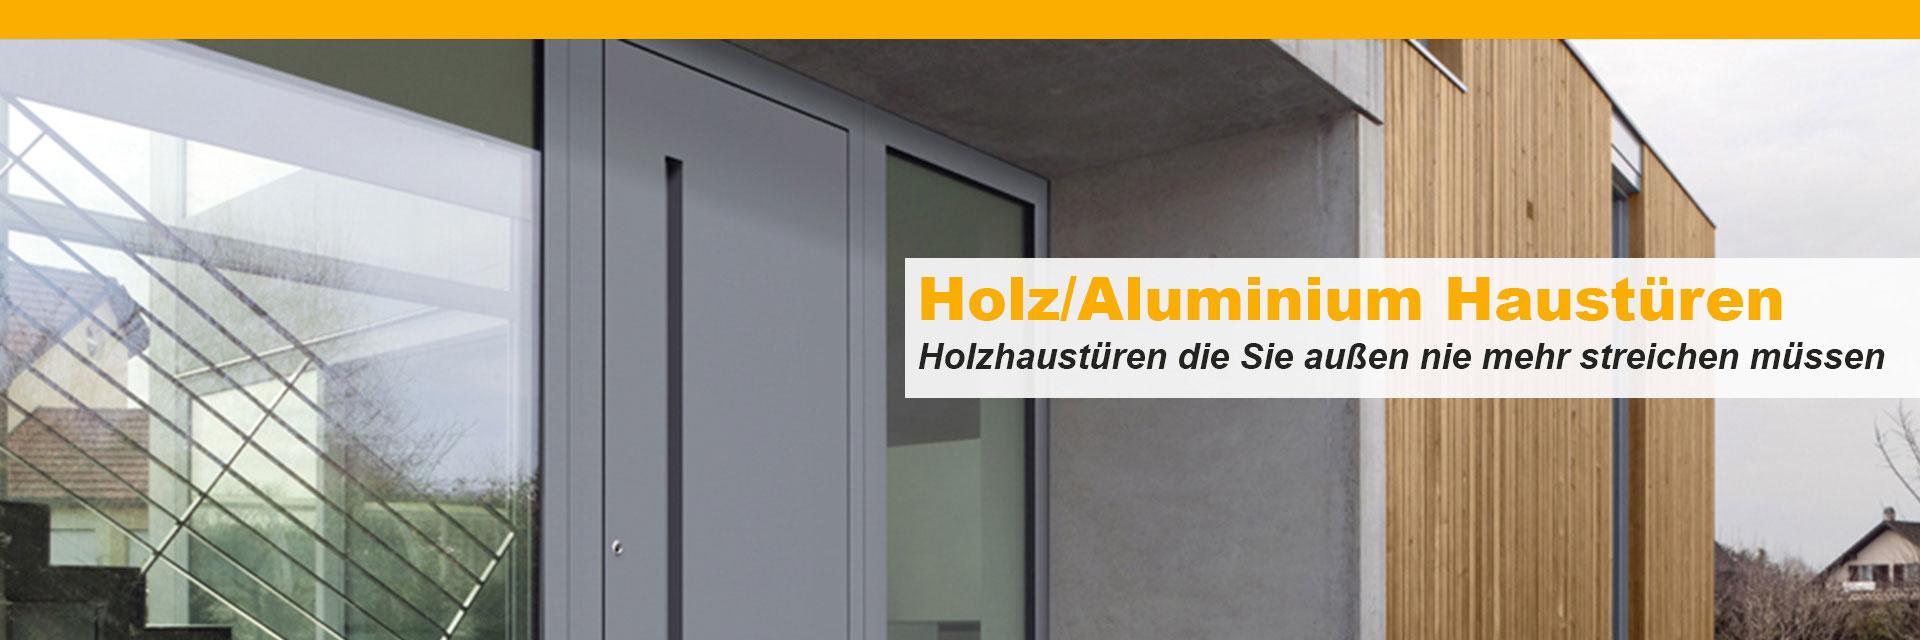 moderne holz aluminium haust ren direkt vom fachbetrieb. Black Bedroom Furniture Sets. Home Design Ideas